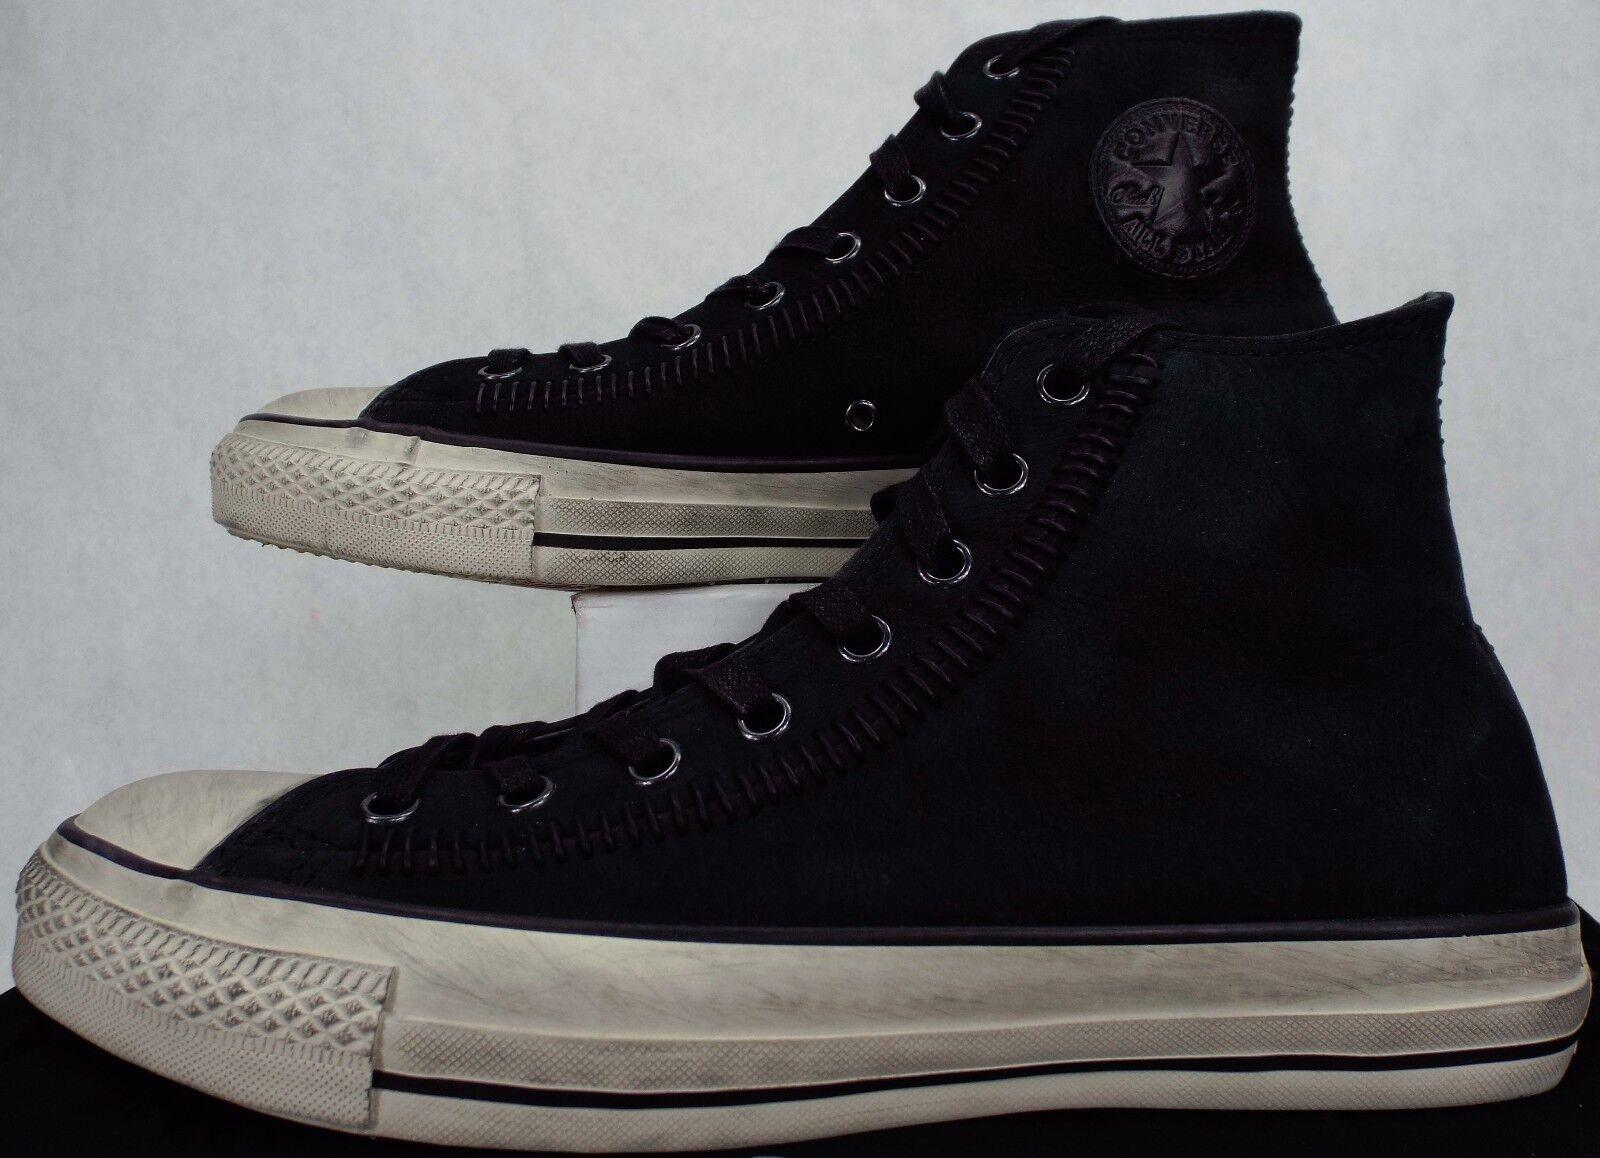 New Mens 9.5 CONVERSE John Varvatos CT HI Black Leather Shoes 180 150209C